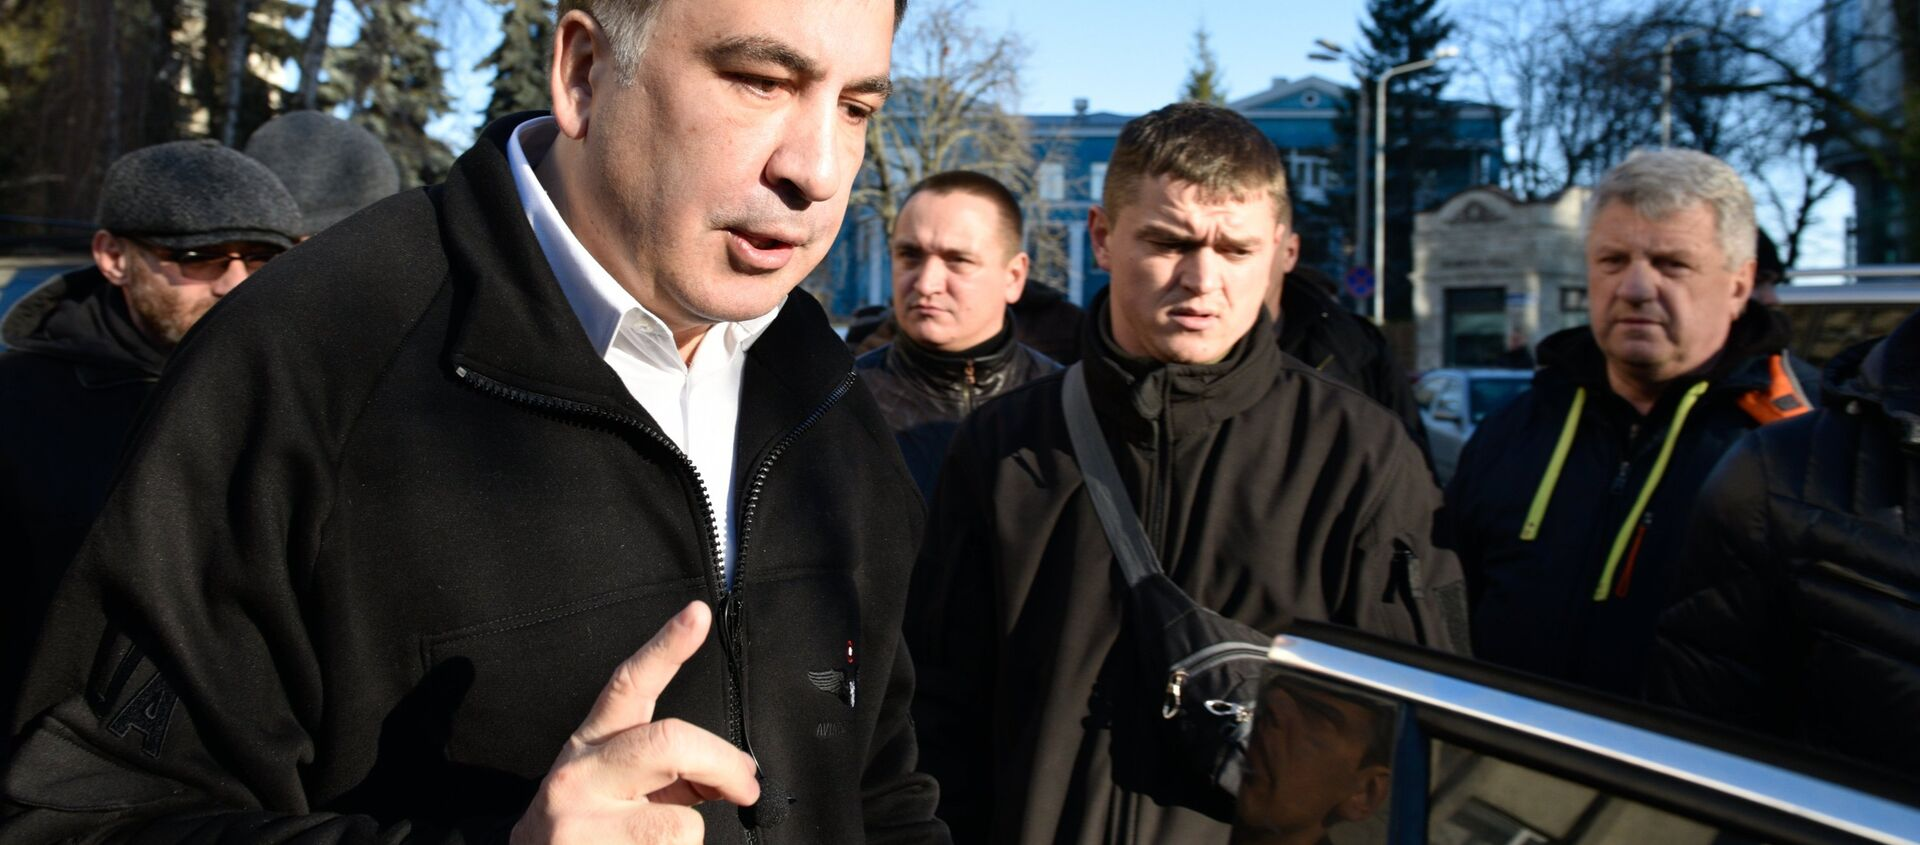 Mijaíl Saakashvili, expresidente de Georgia - Sputnik Mundo, 1920, 17.10.2018